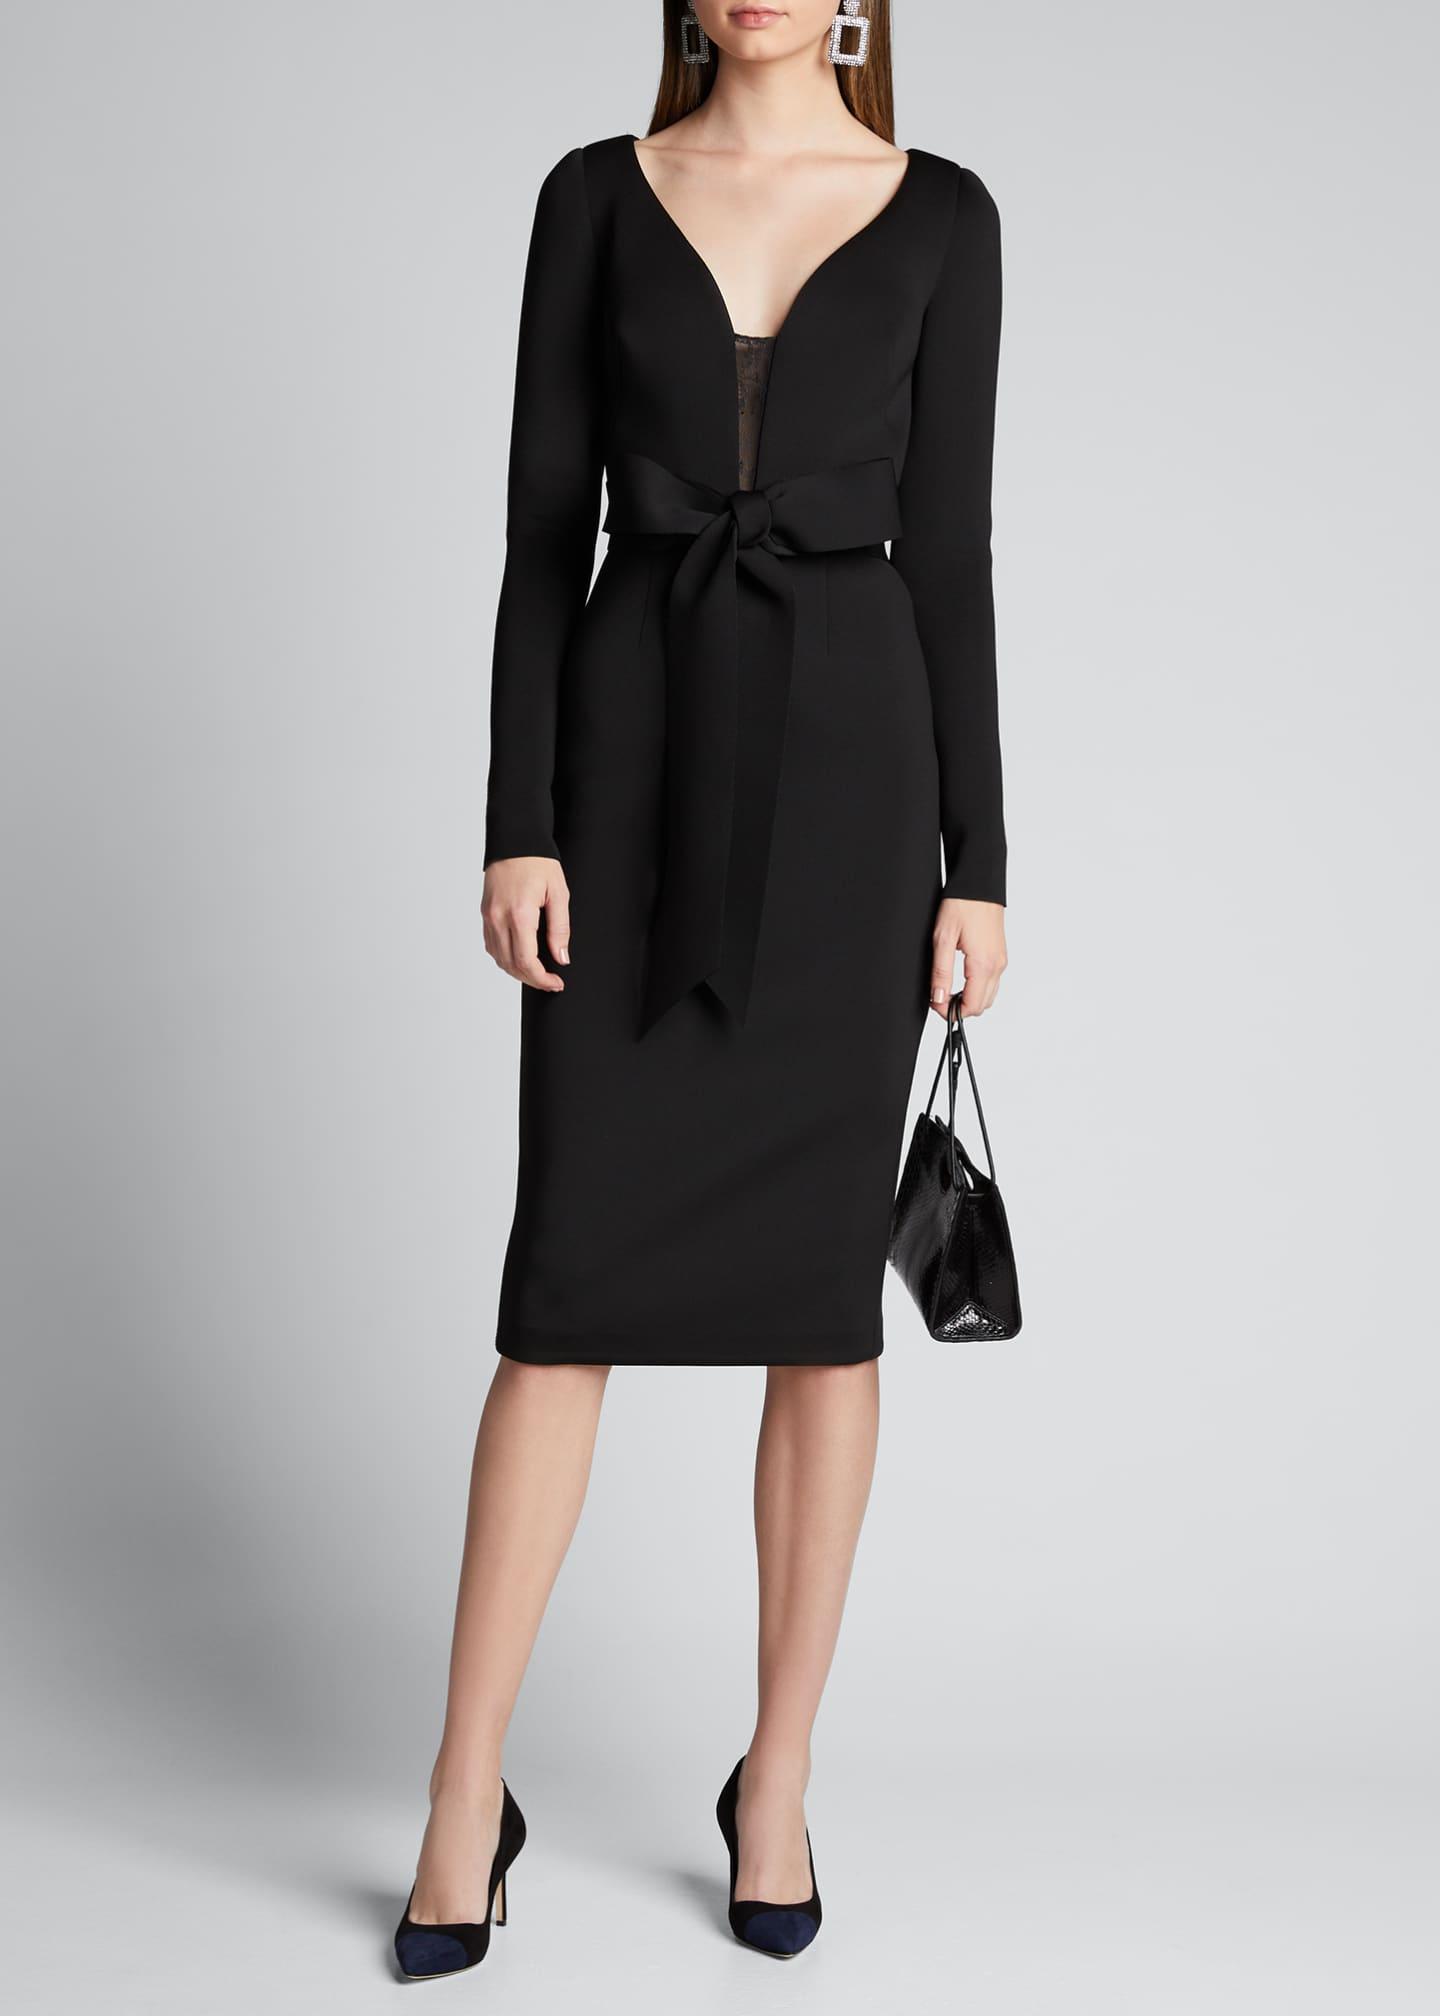 Badgley Mischka Collection V-Neck Long-Sleeve Scuba Dress with